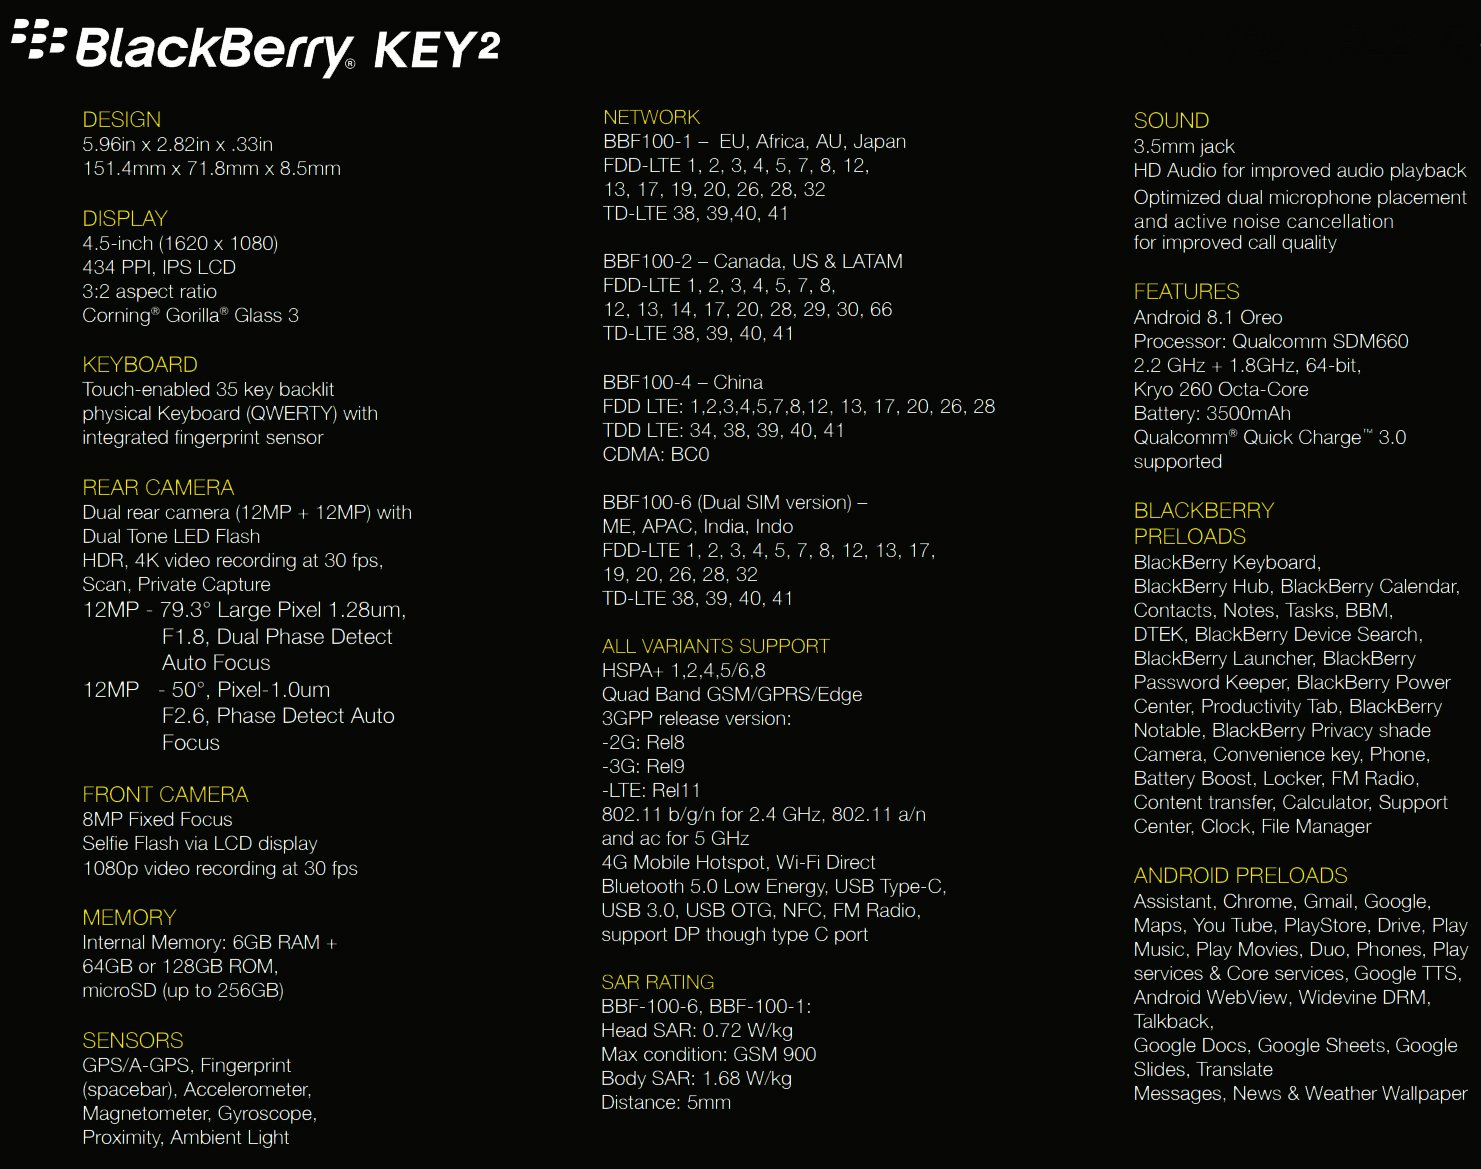 key2_specs.jpg